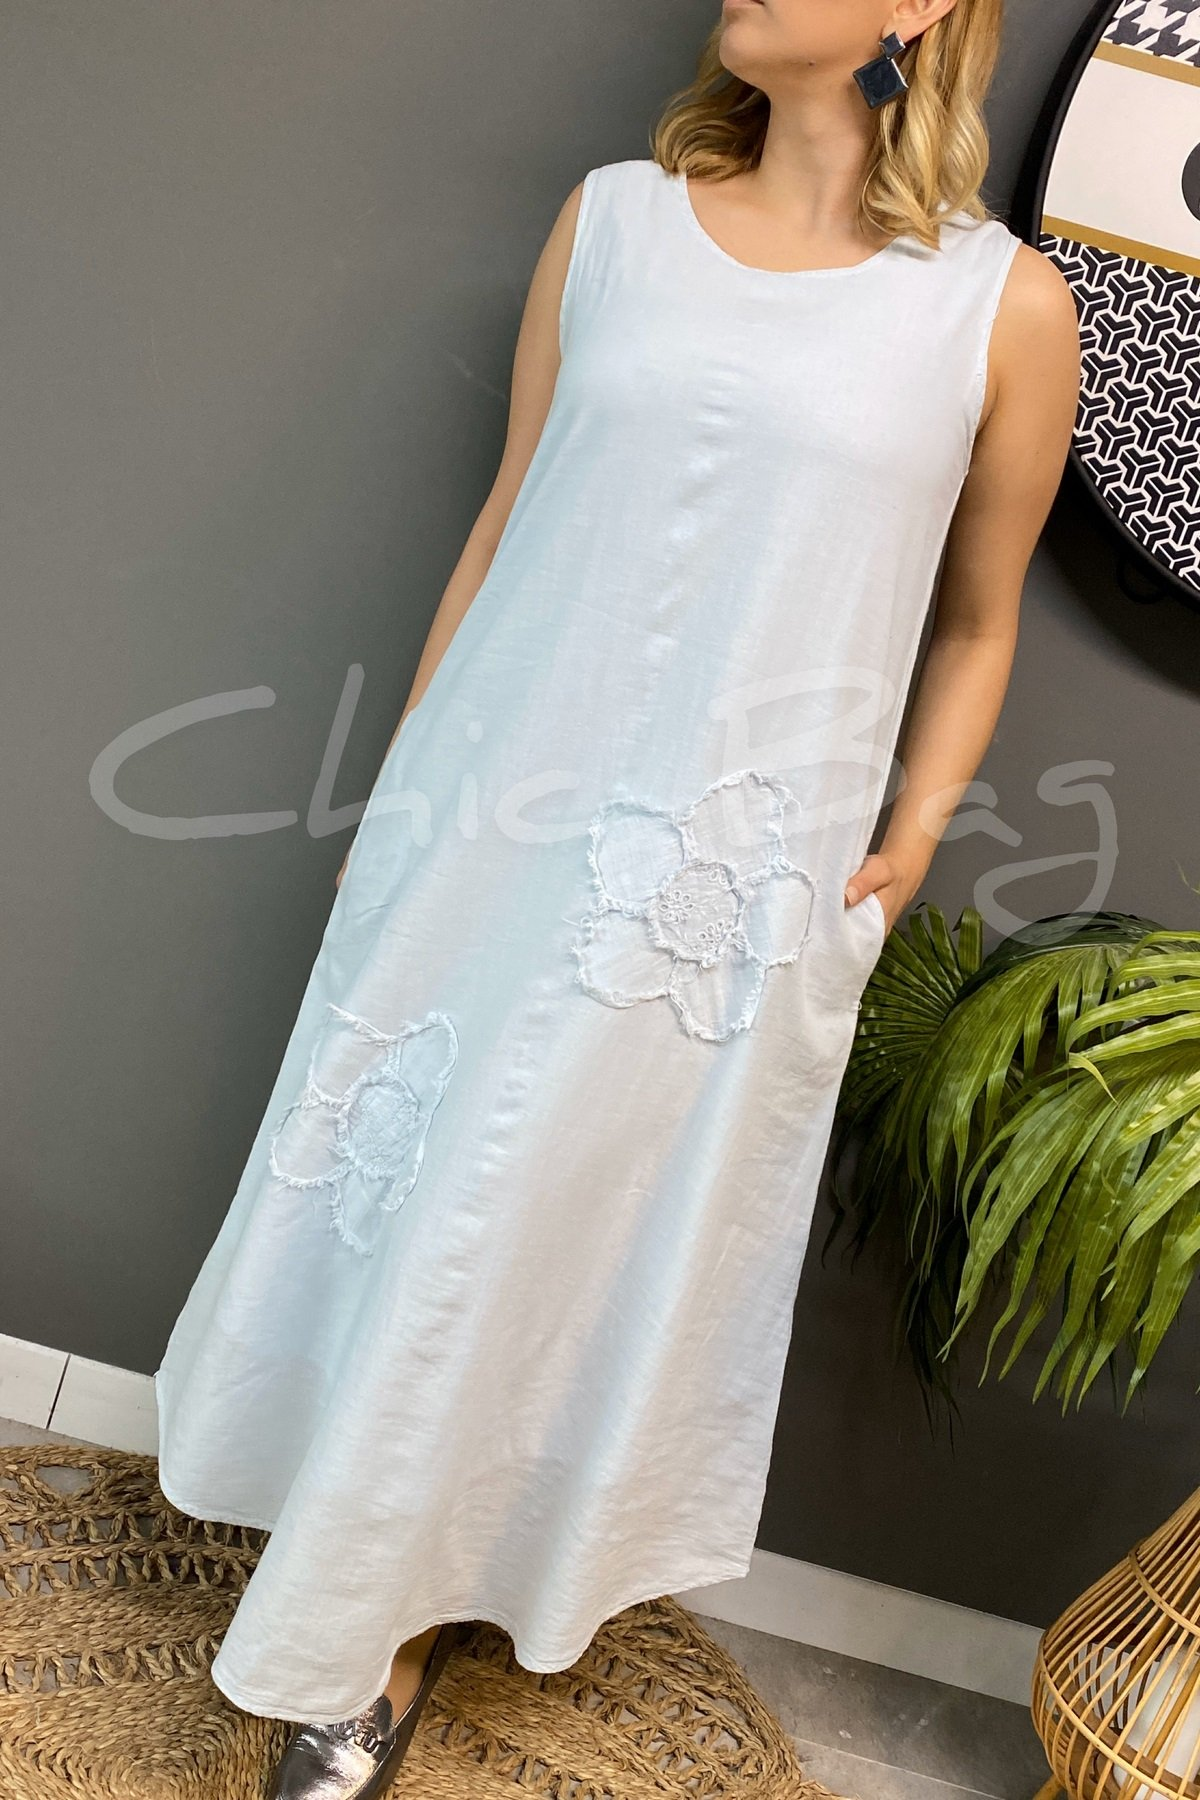 https://resim.chicbag.com.tr/p000757/mnt/papatyali-kolsuz-etegi-oval-elbise-mltm-01e08247a0ee.